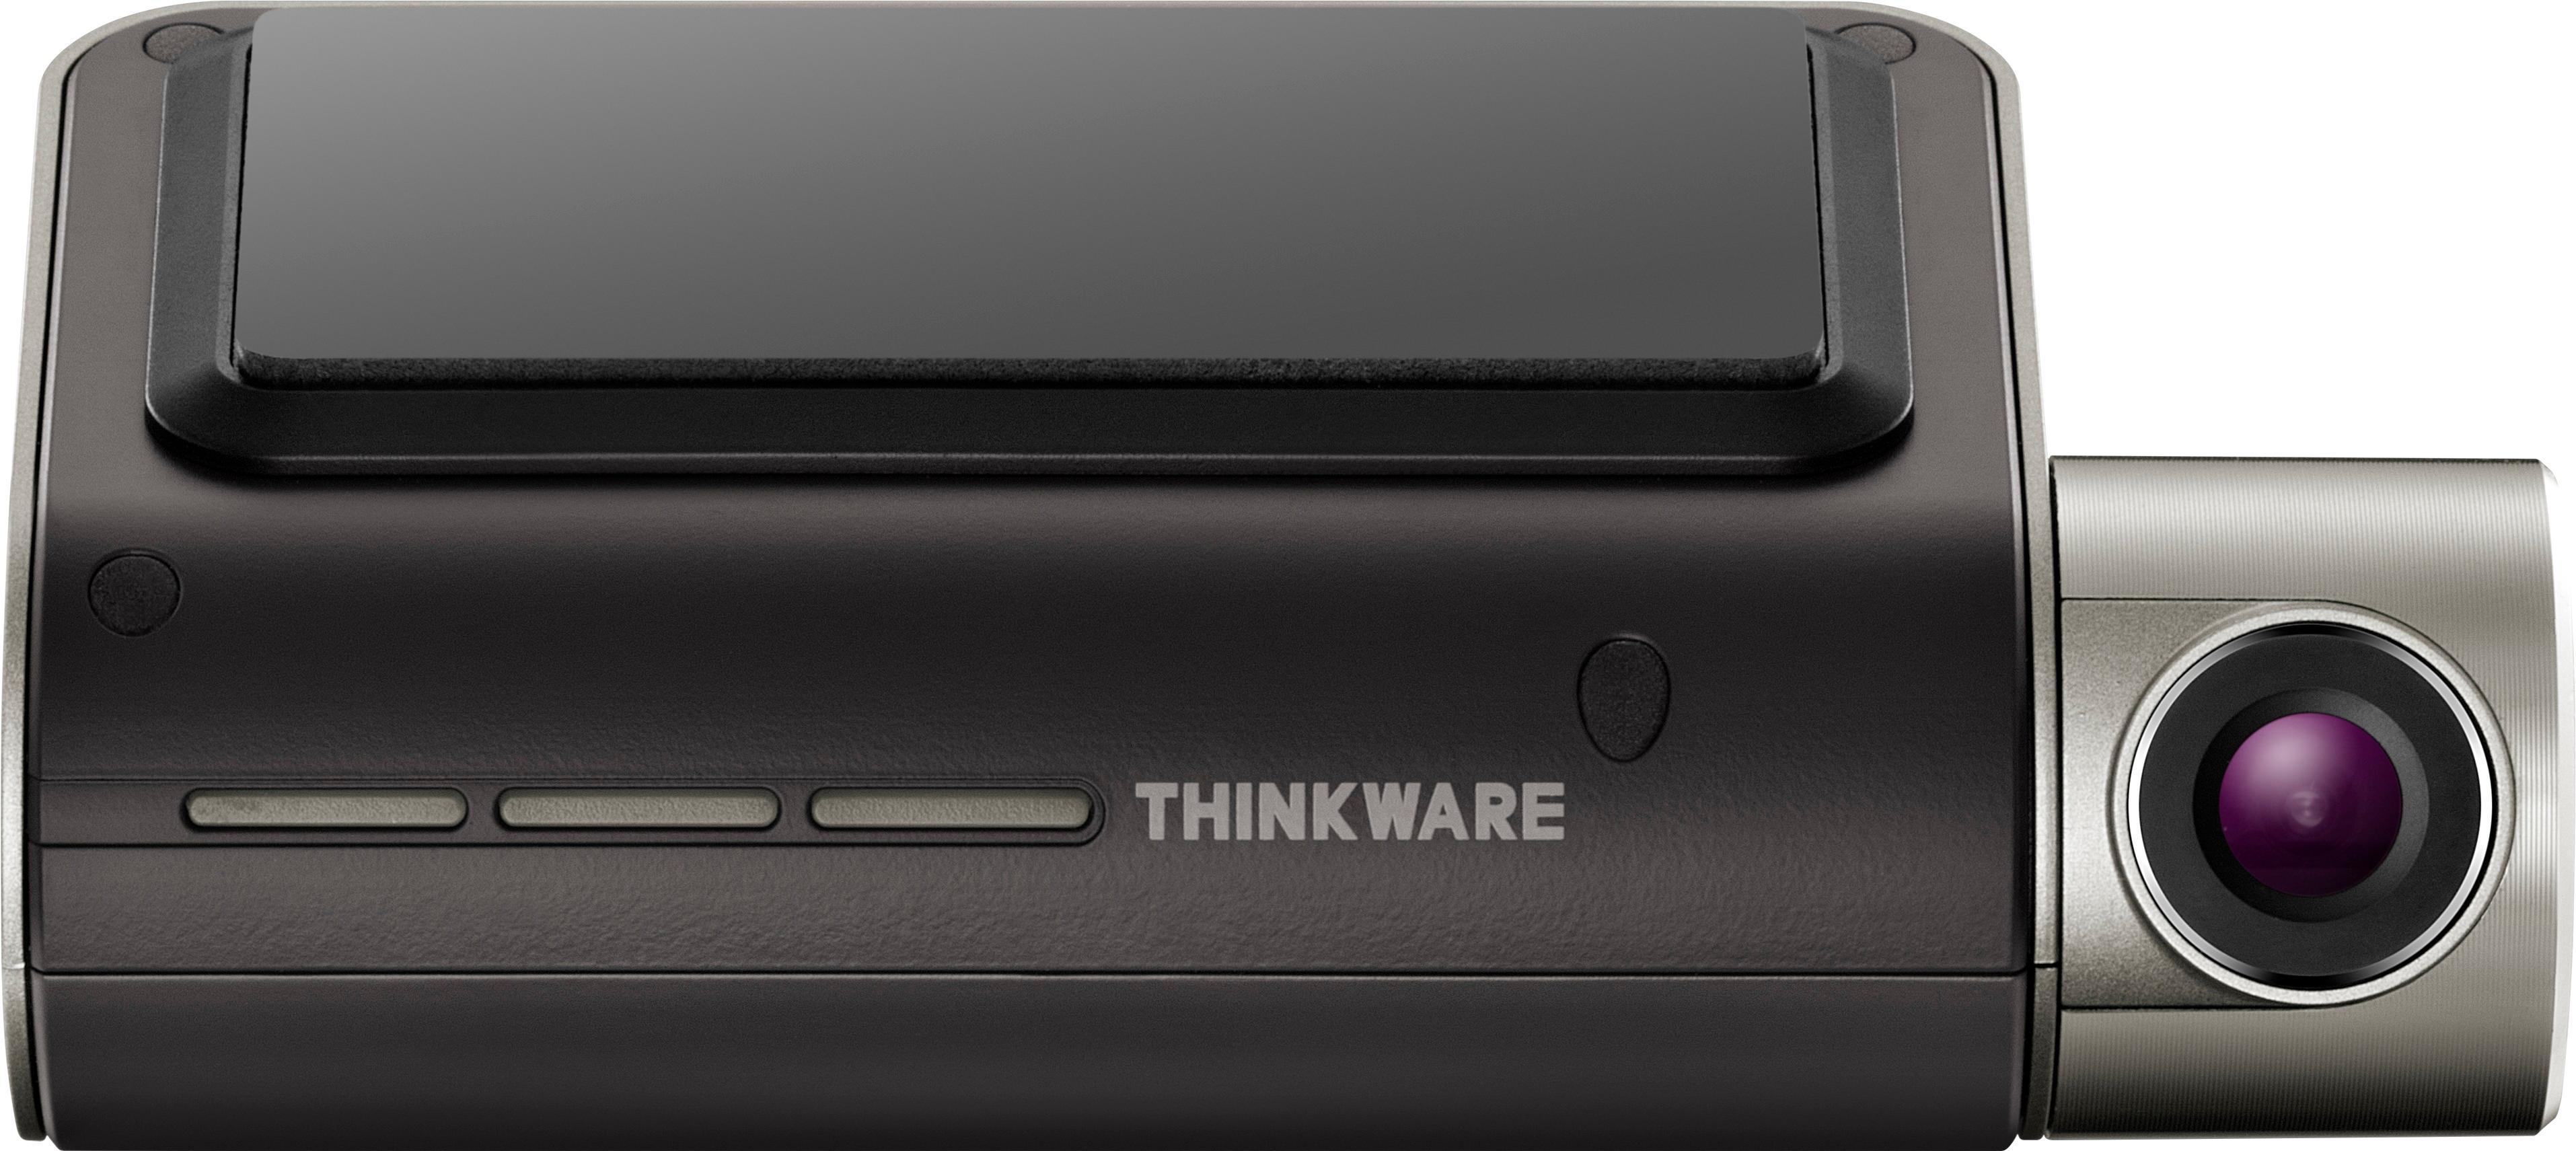 THINKWARE - F800 Dash Cam - Gray